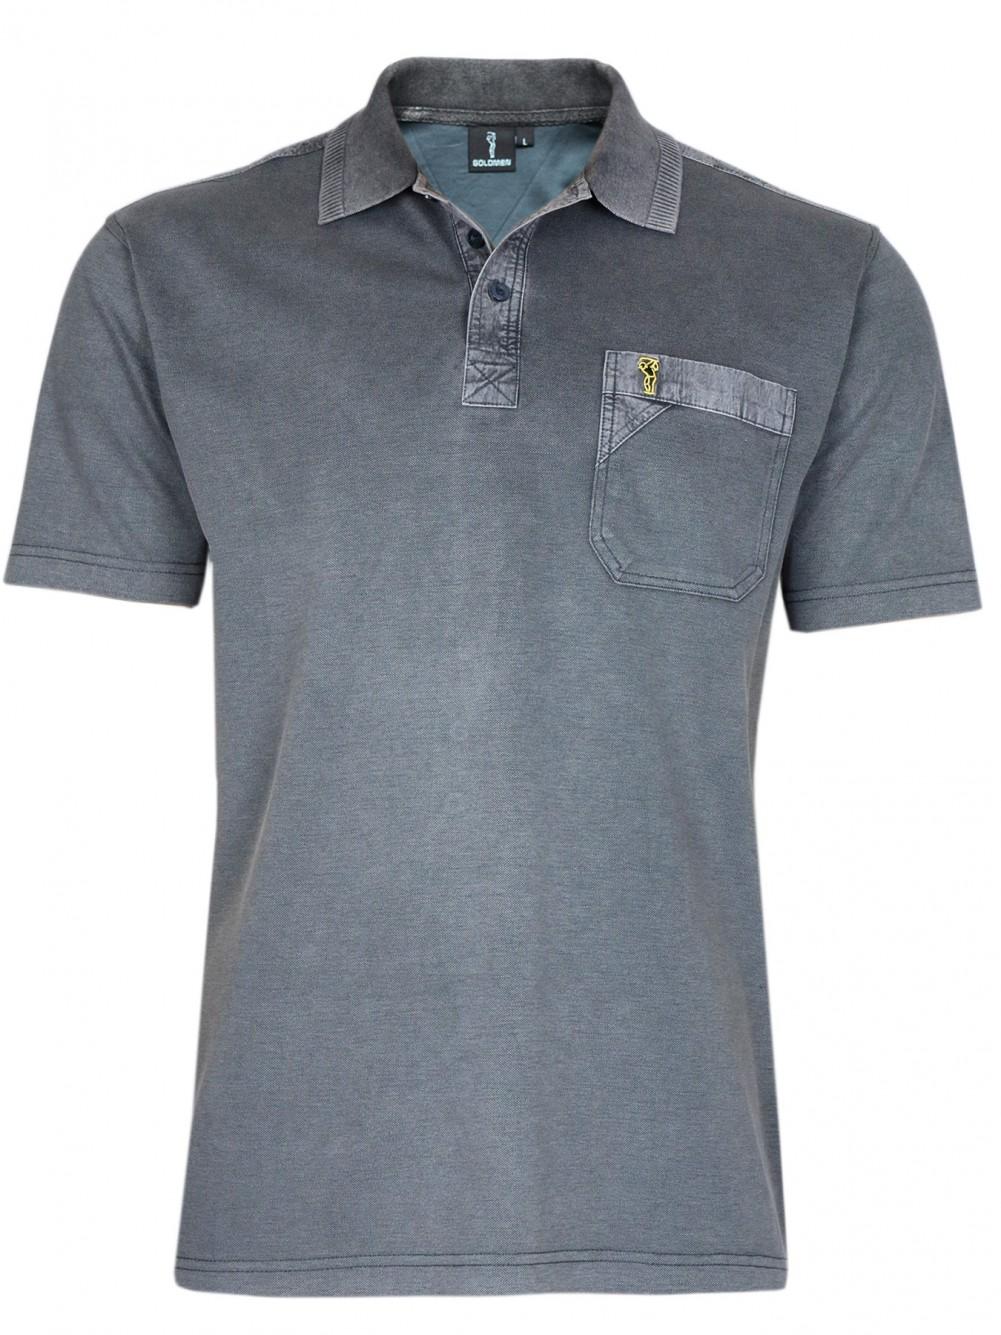 Poloshirt Piqué-Polo aus Baumwoll-Stretch - Anthrazit